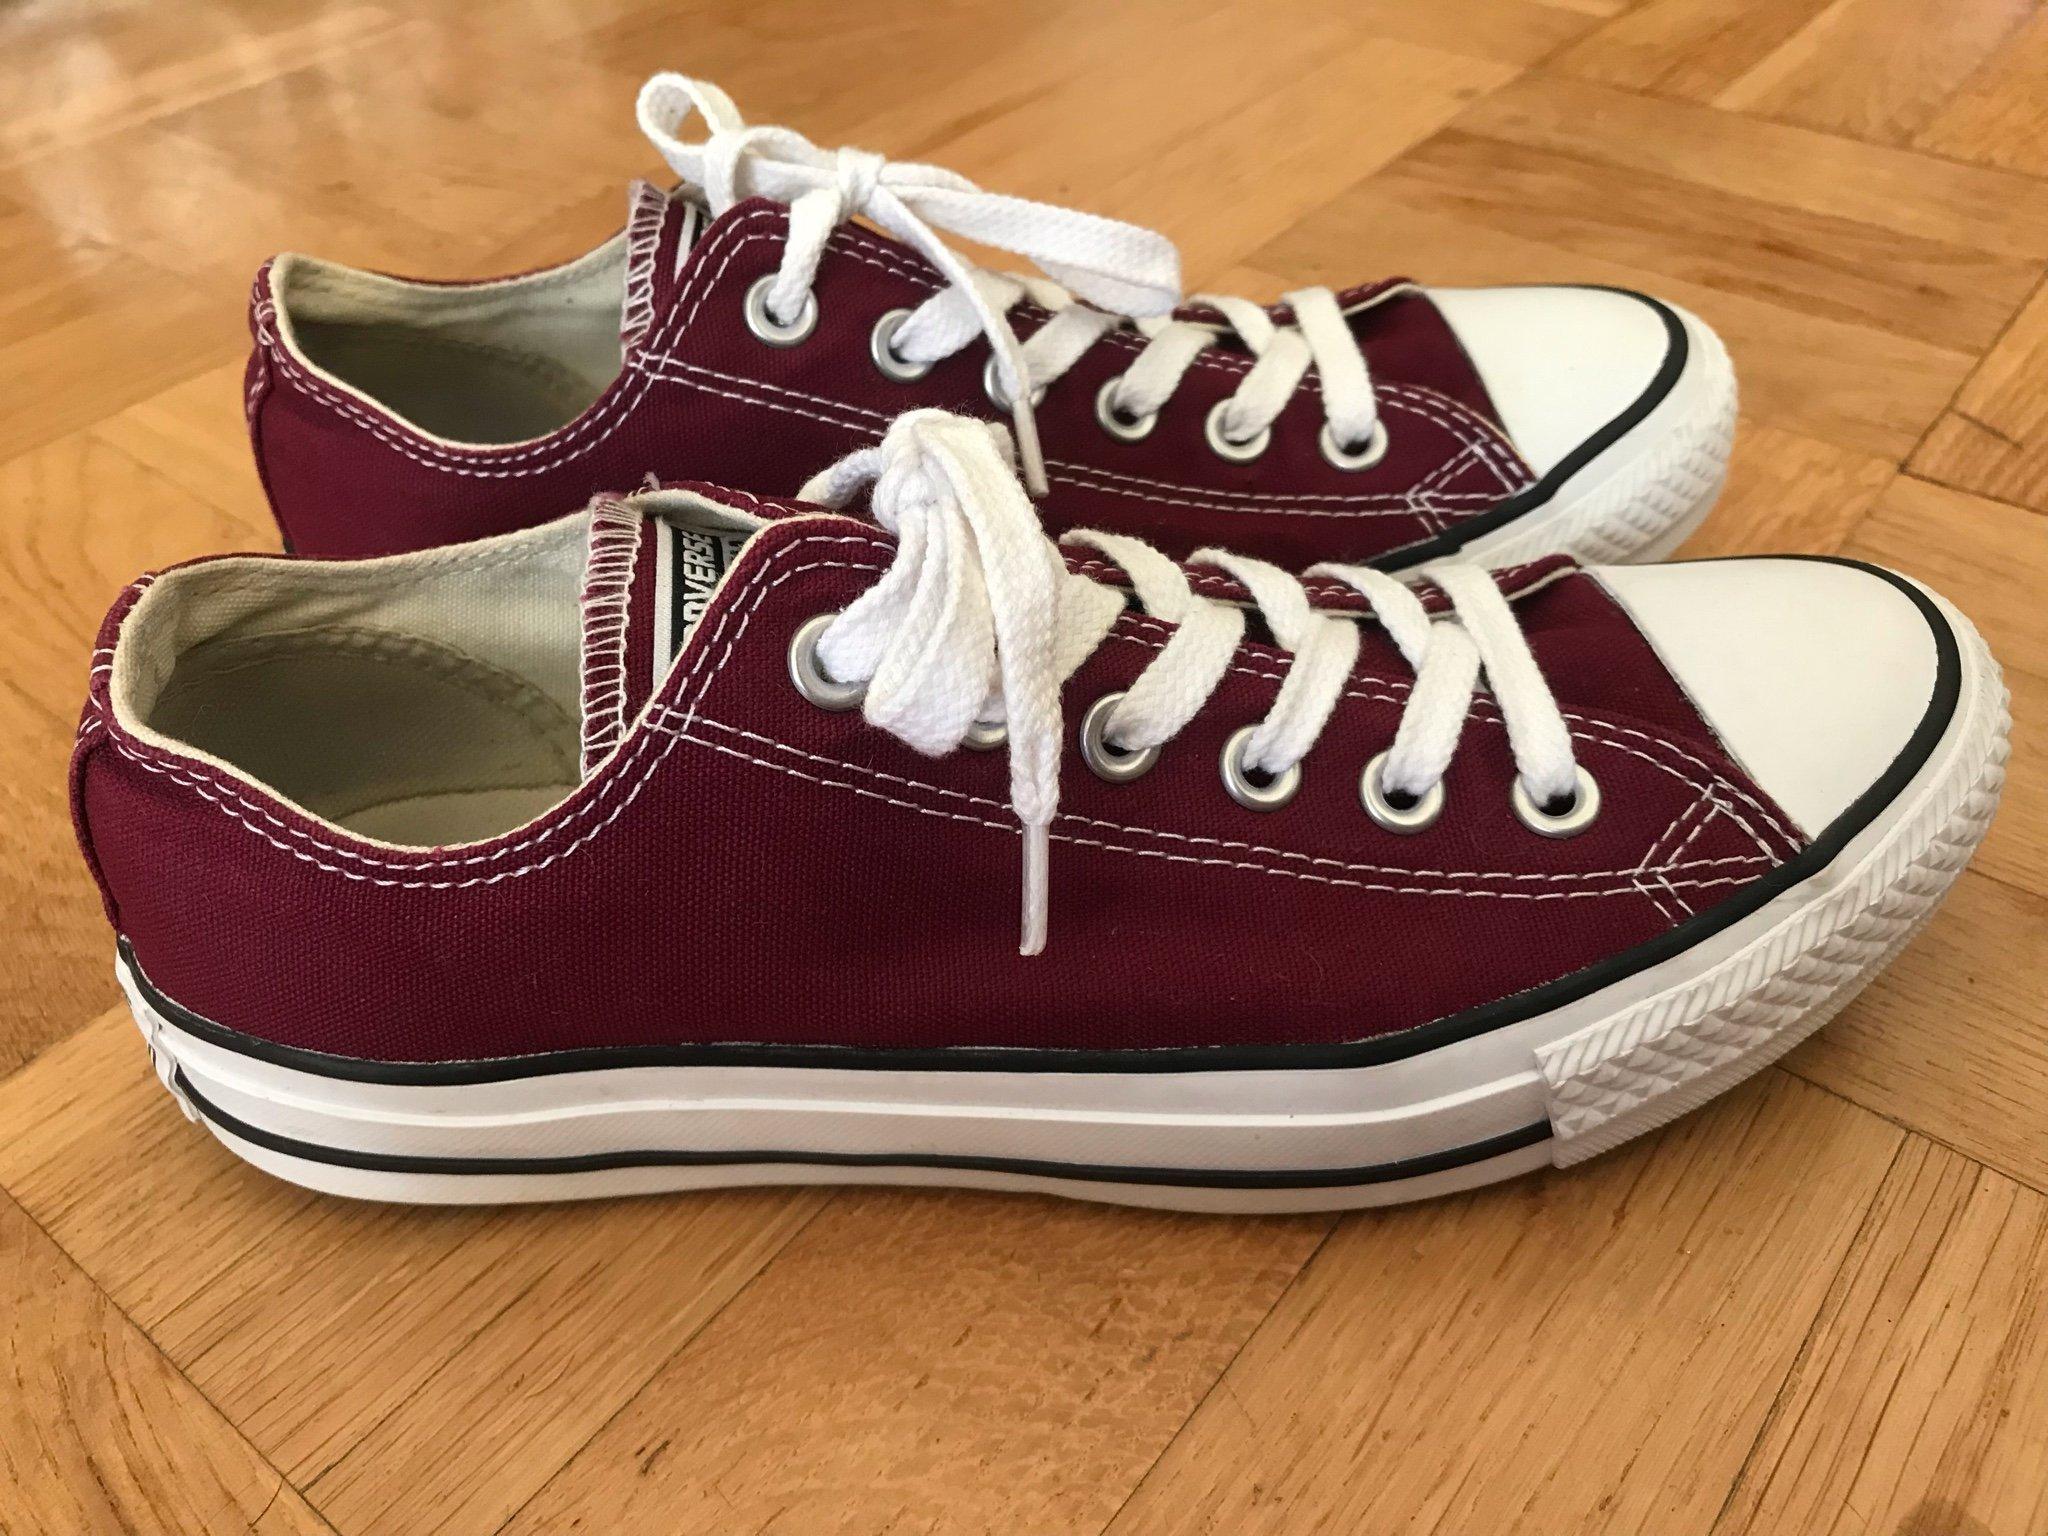 aca7741497b Converse stl 37,5 (38) sneakers skor vinröd röd (352577913) ᐈ Köp ...